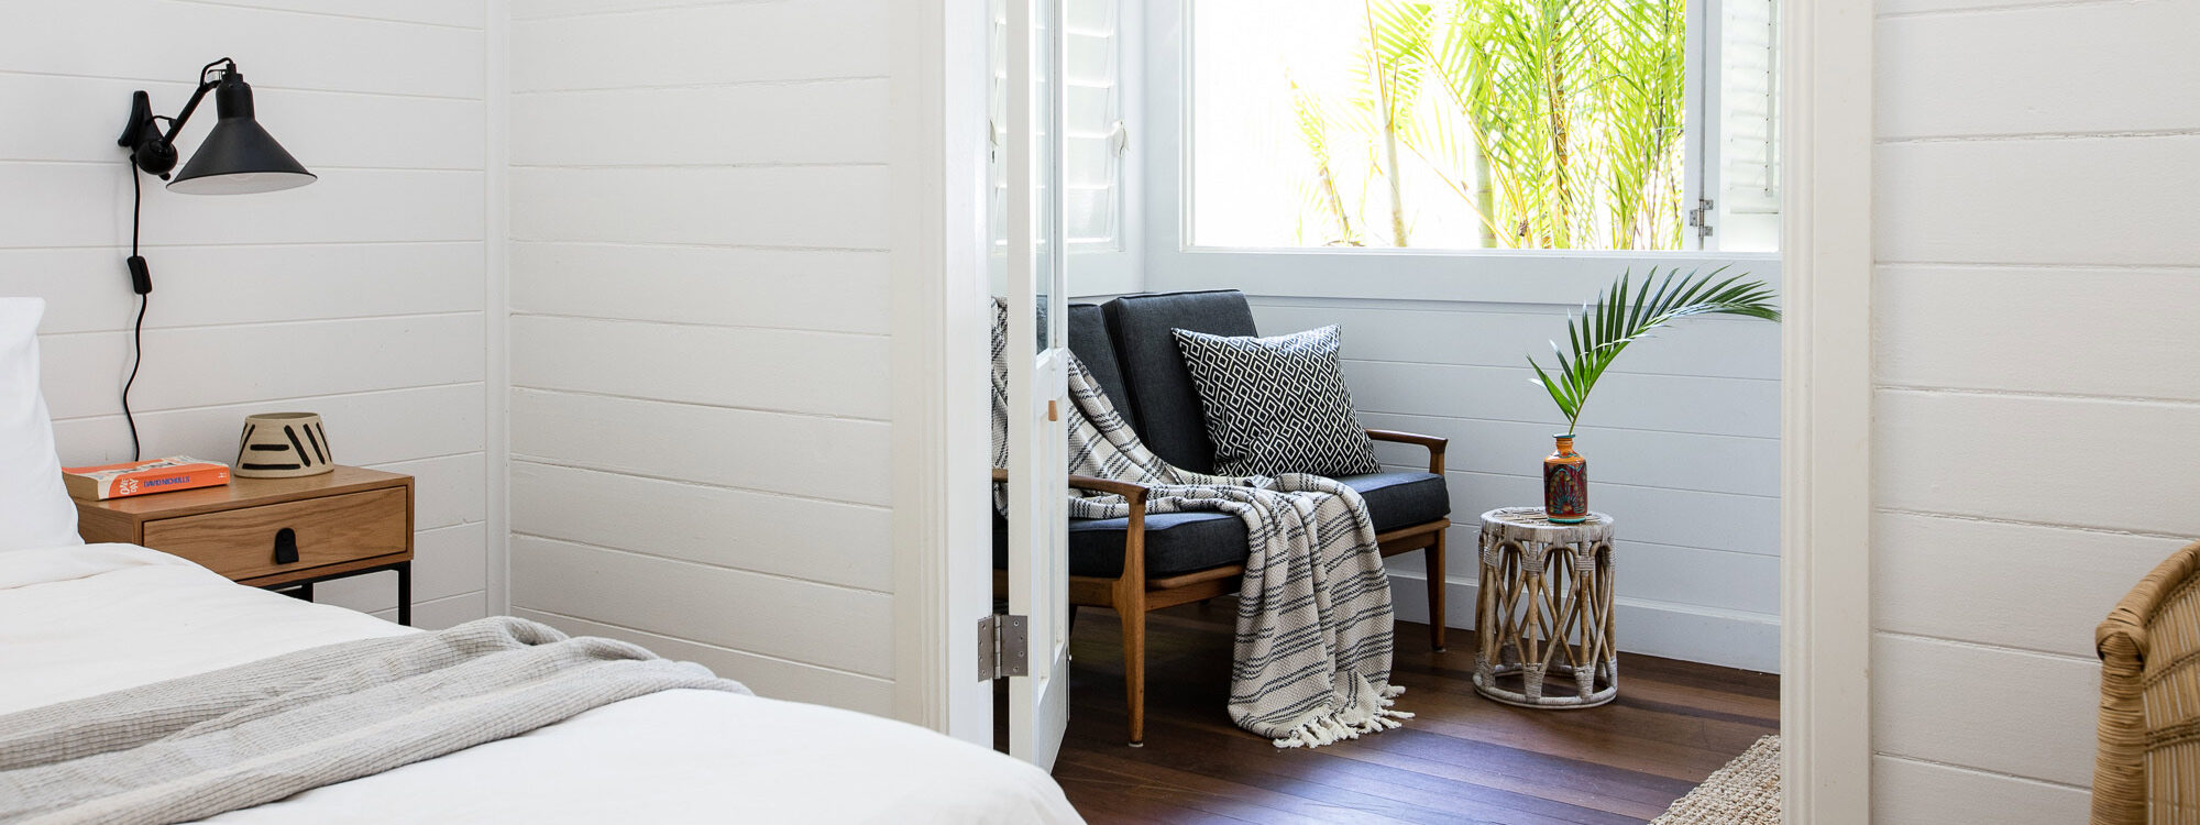 Kia Ora - Byron Bay - Master Bedroom through to enclosed sitting area